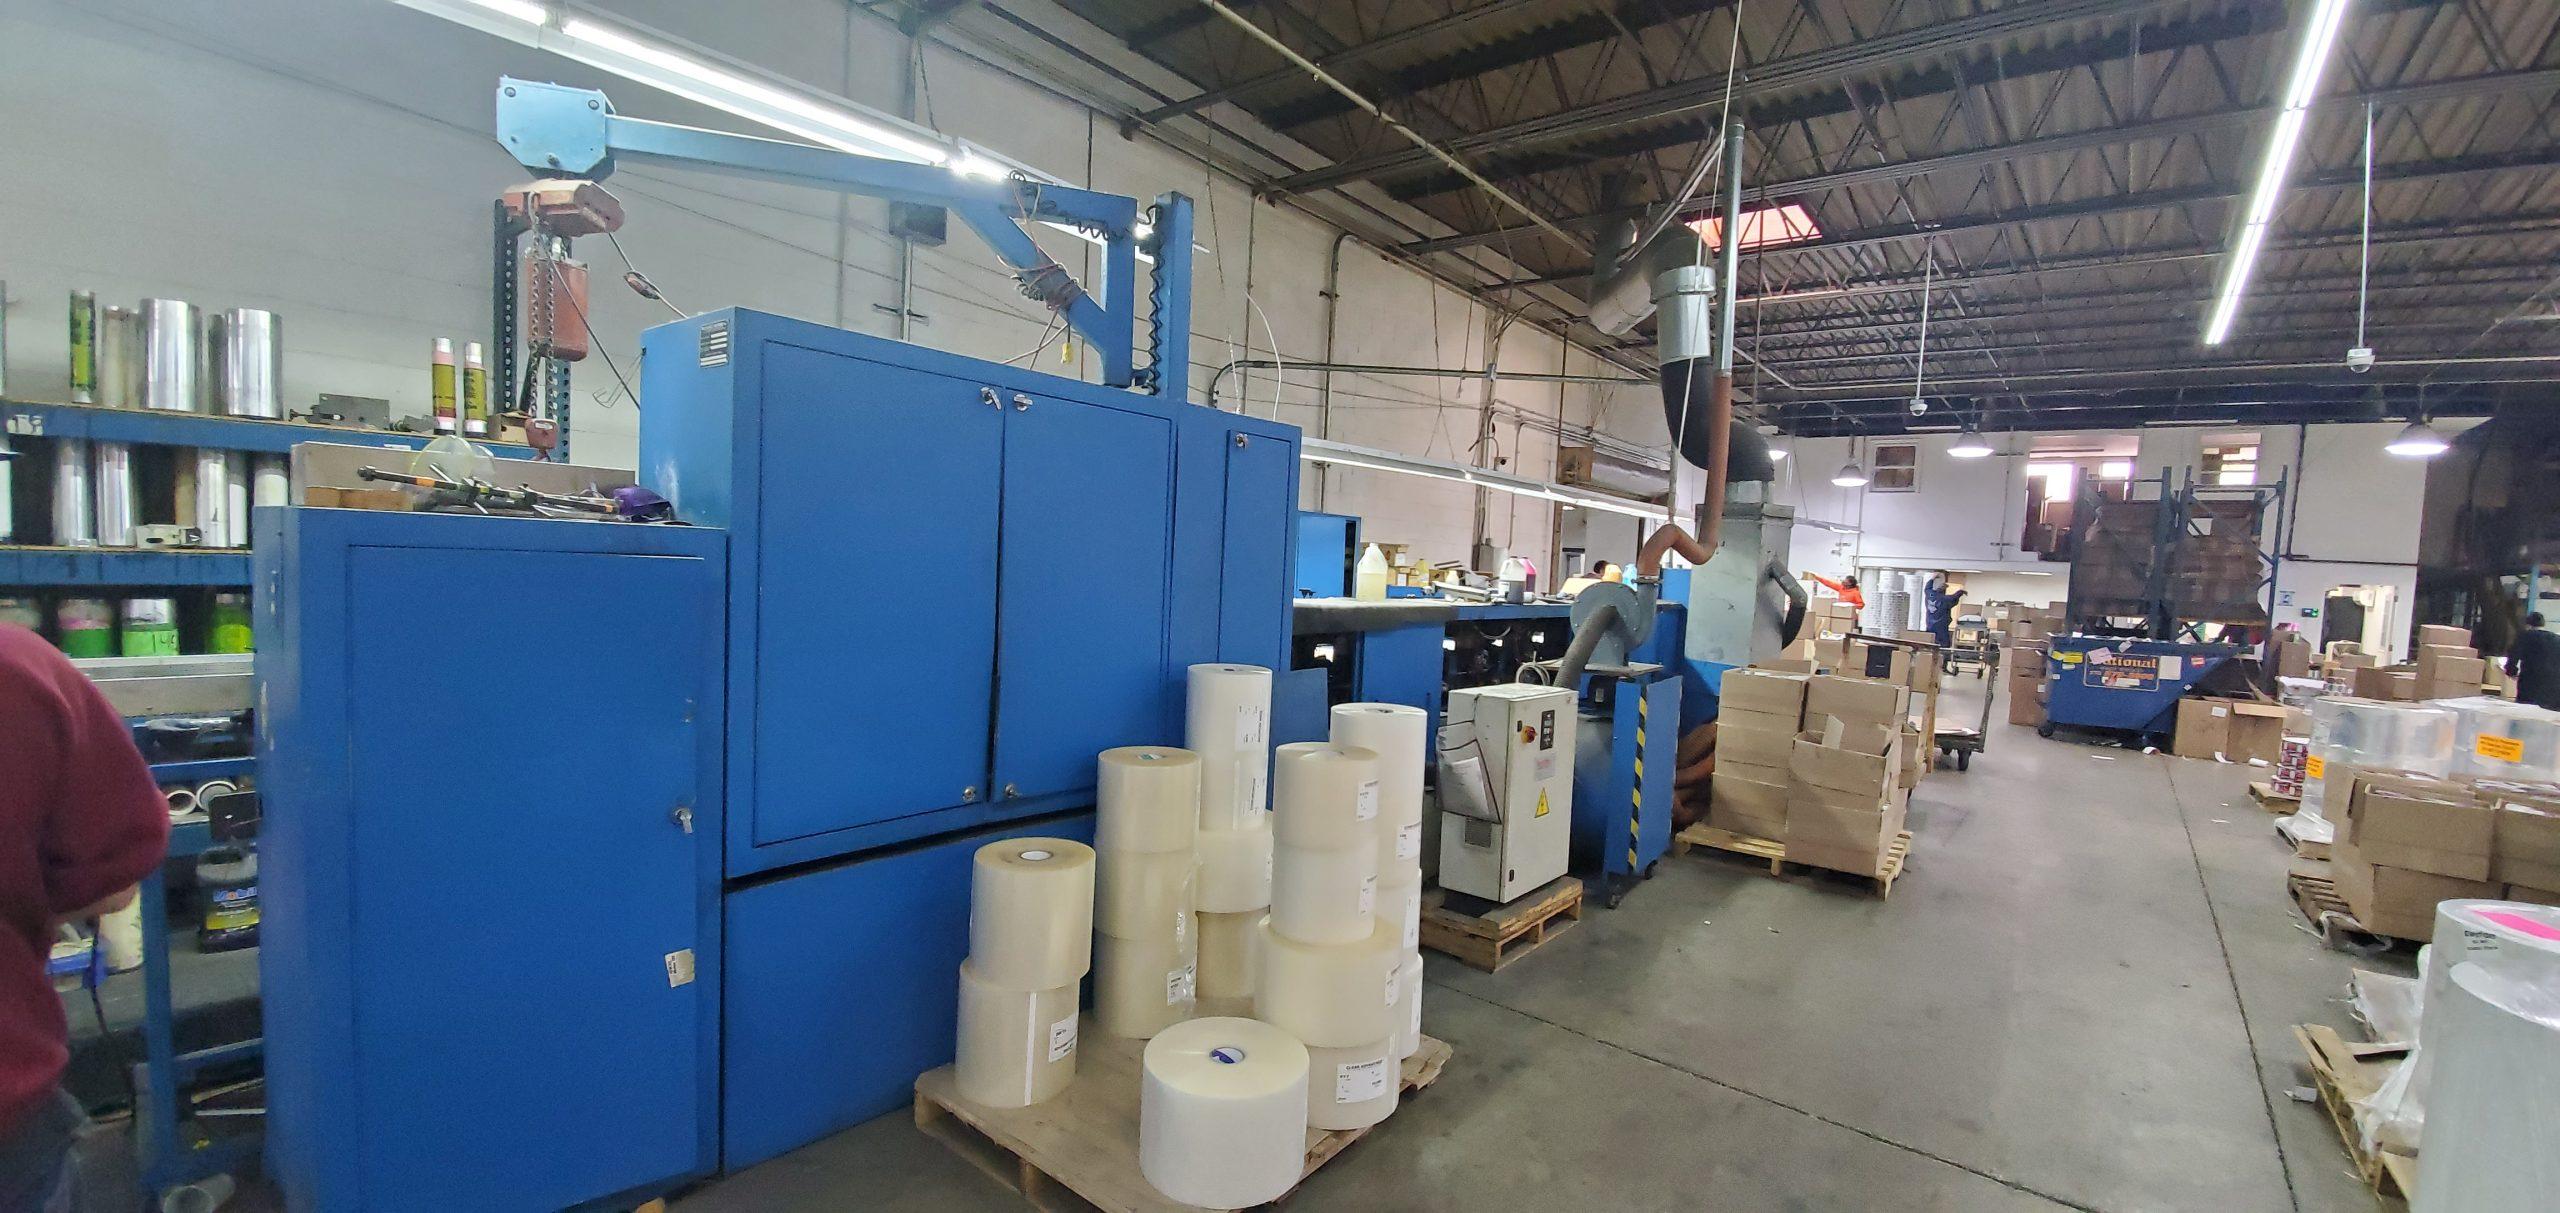 Aquaflex LWSP-1307 - Used Flexo Printing Presses and Used Flexographic Equipment-14